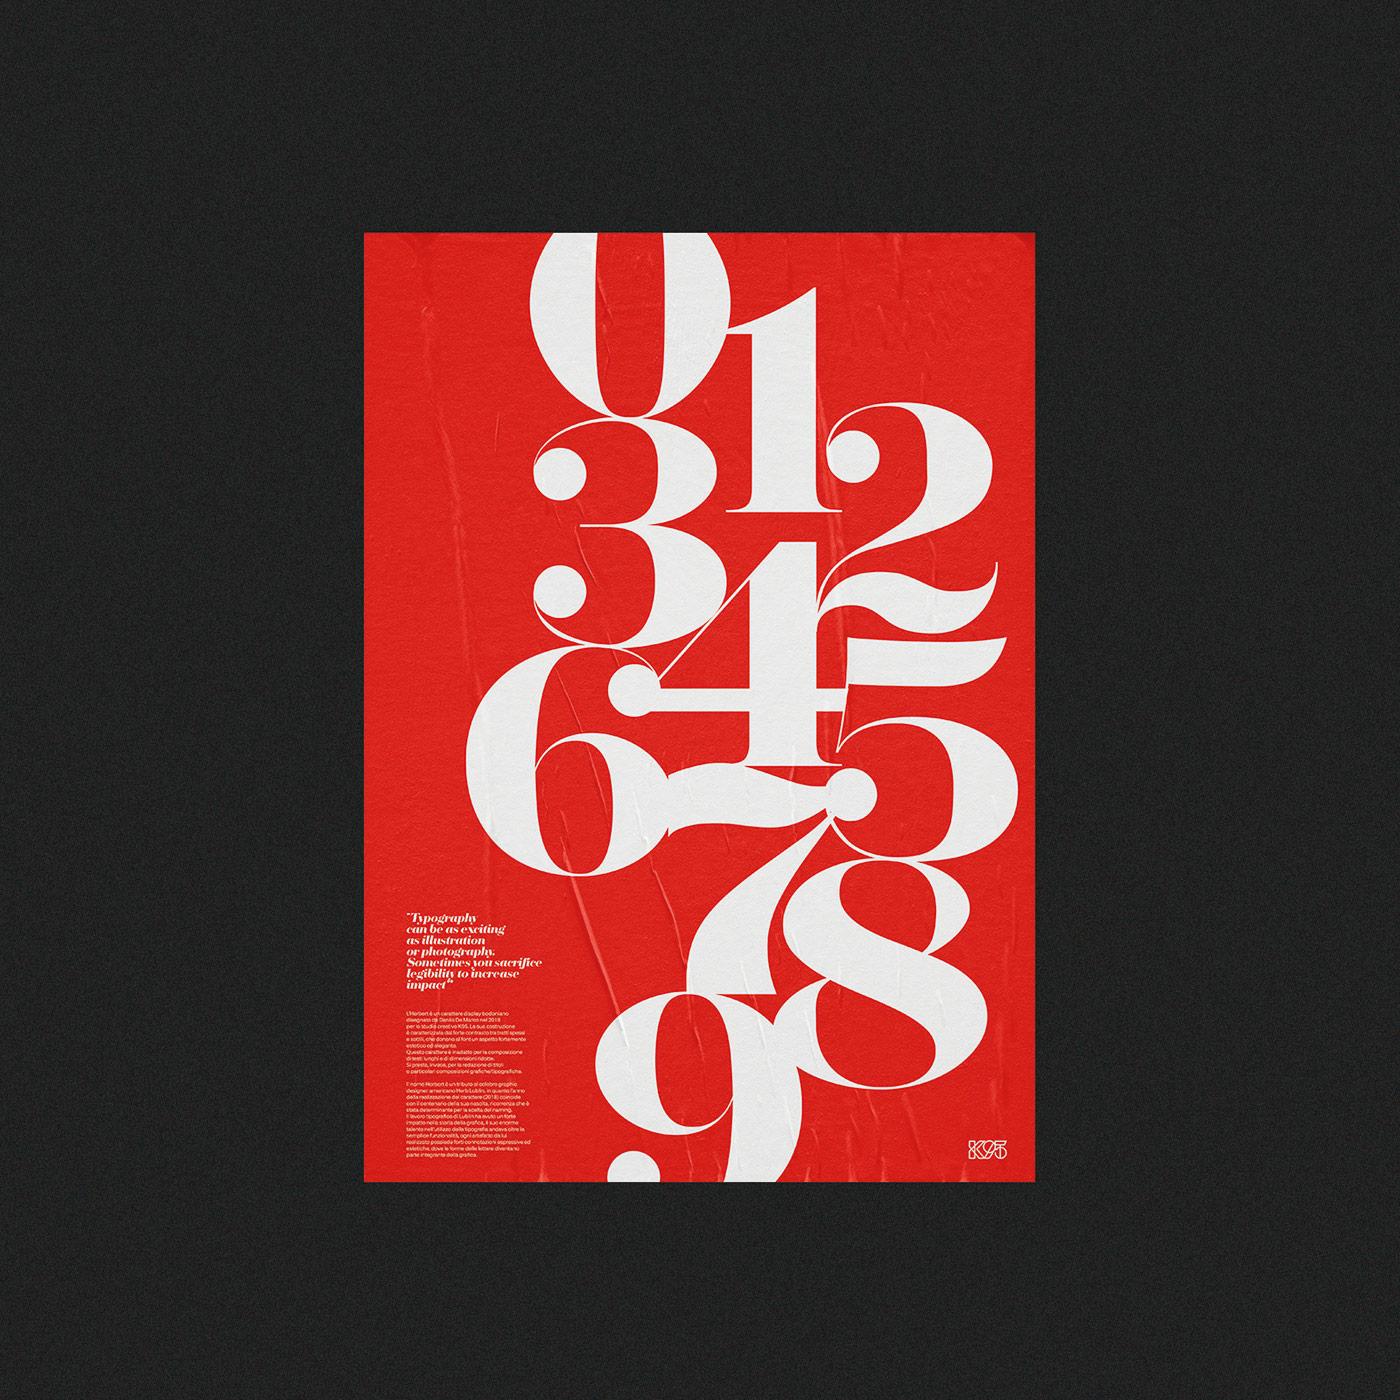 Herbert typeface - promotional posters by Studio K95